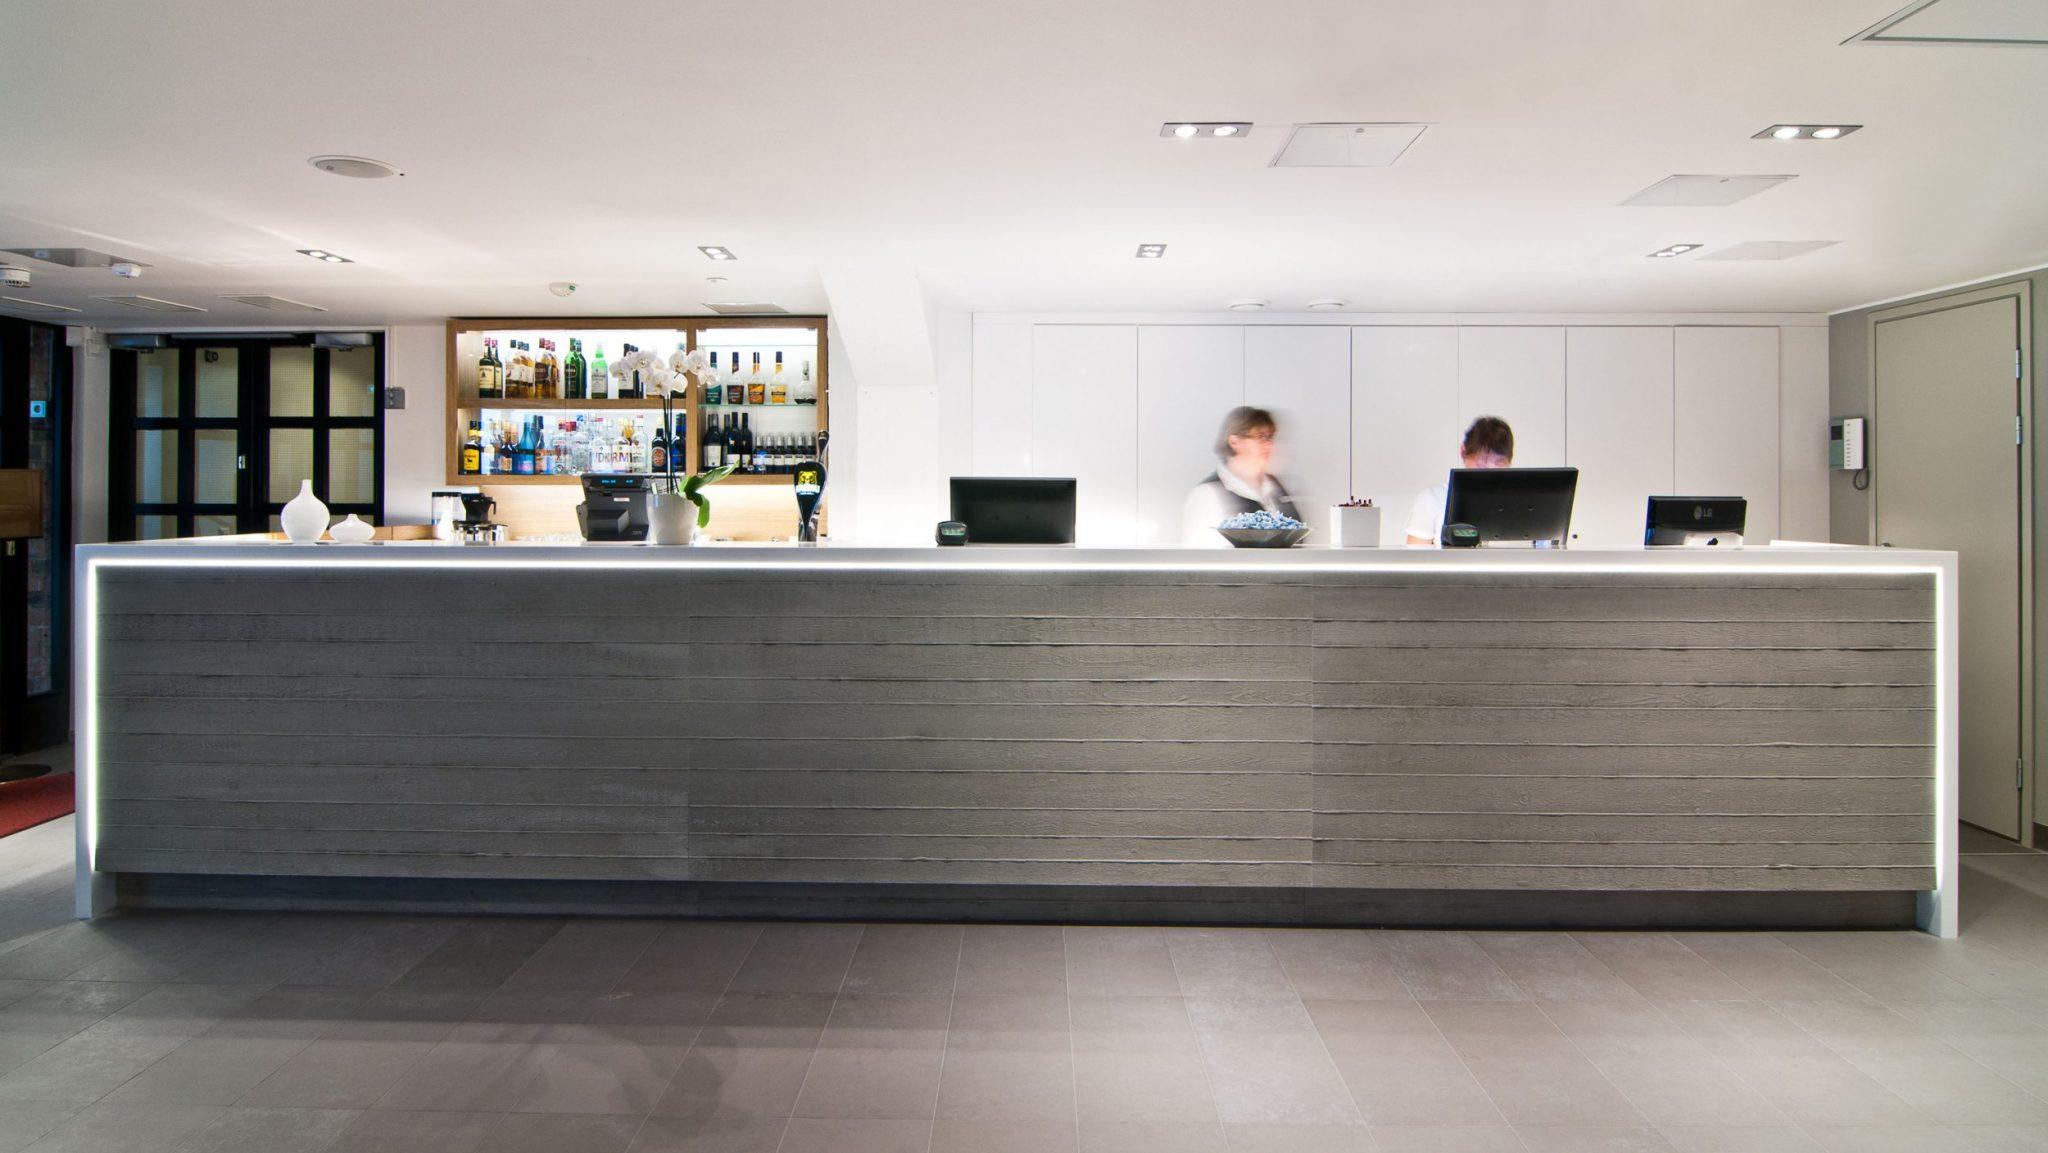 Sokos_Hotel_Villa_Tampere_GI_project-18